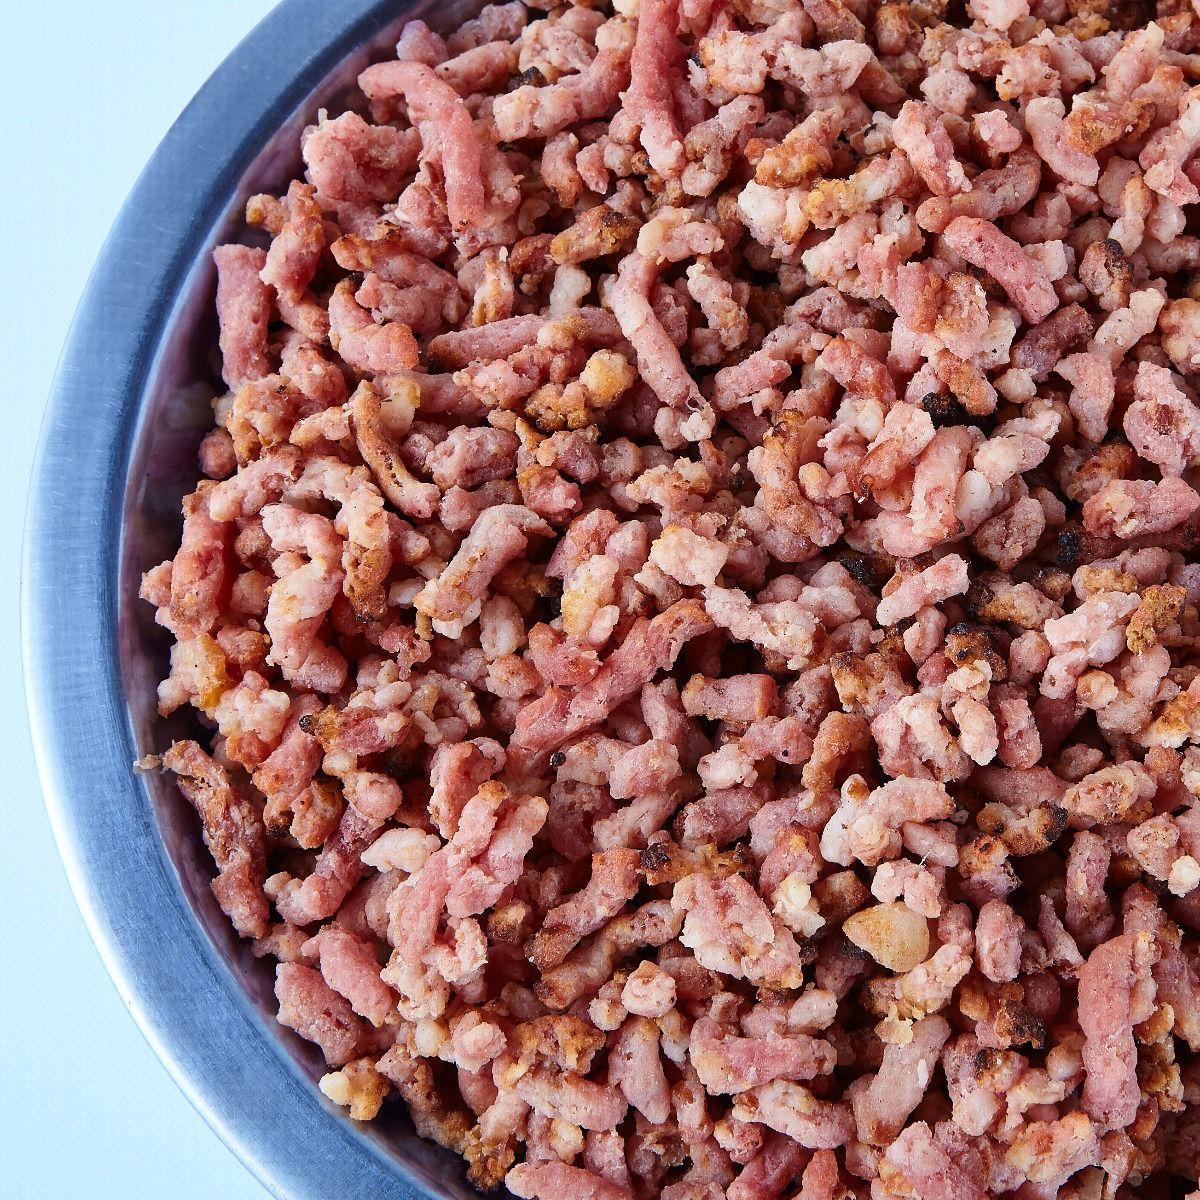 Bacon émietté (6 x 500g)